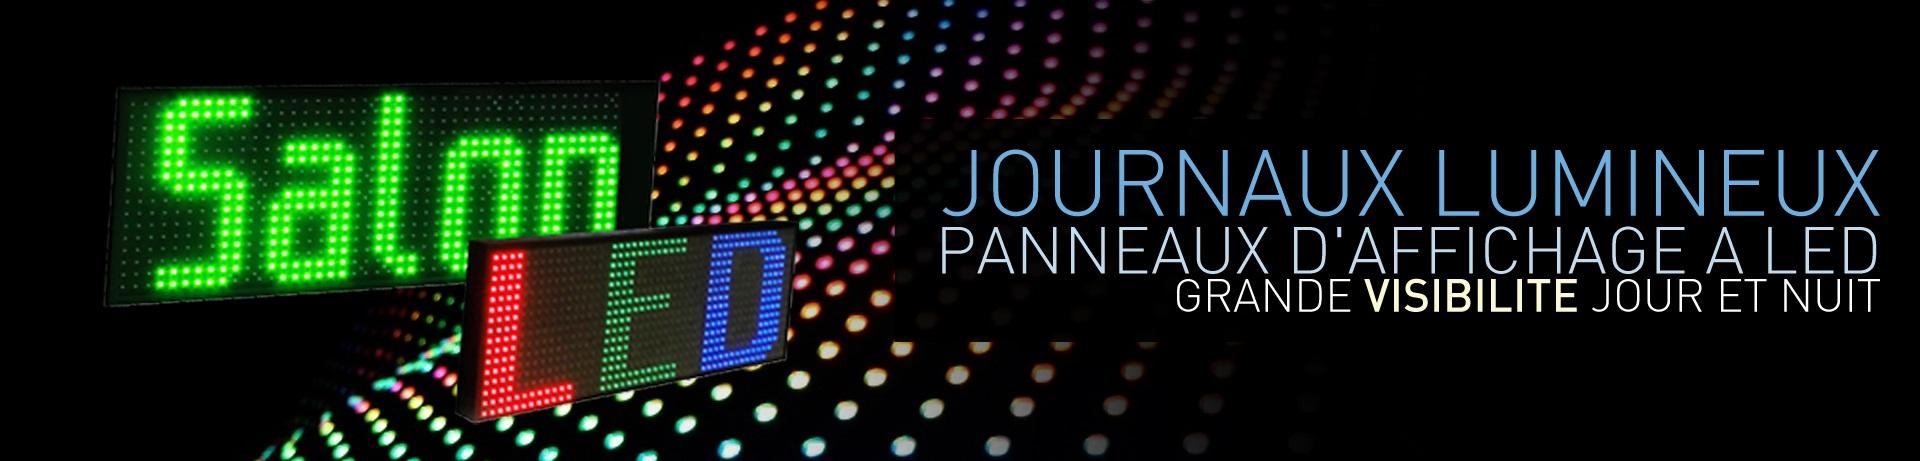 Journal Lumineux